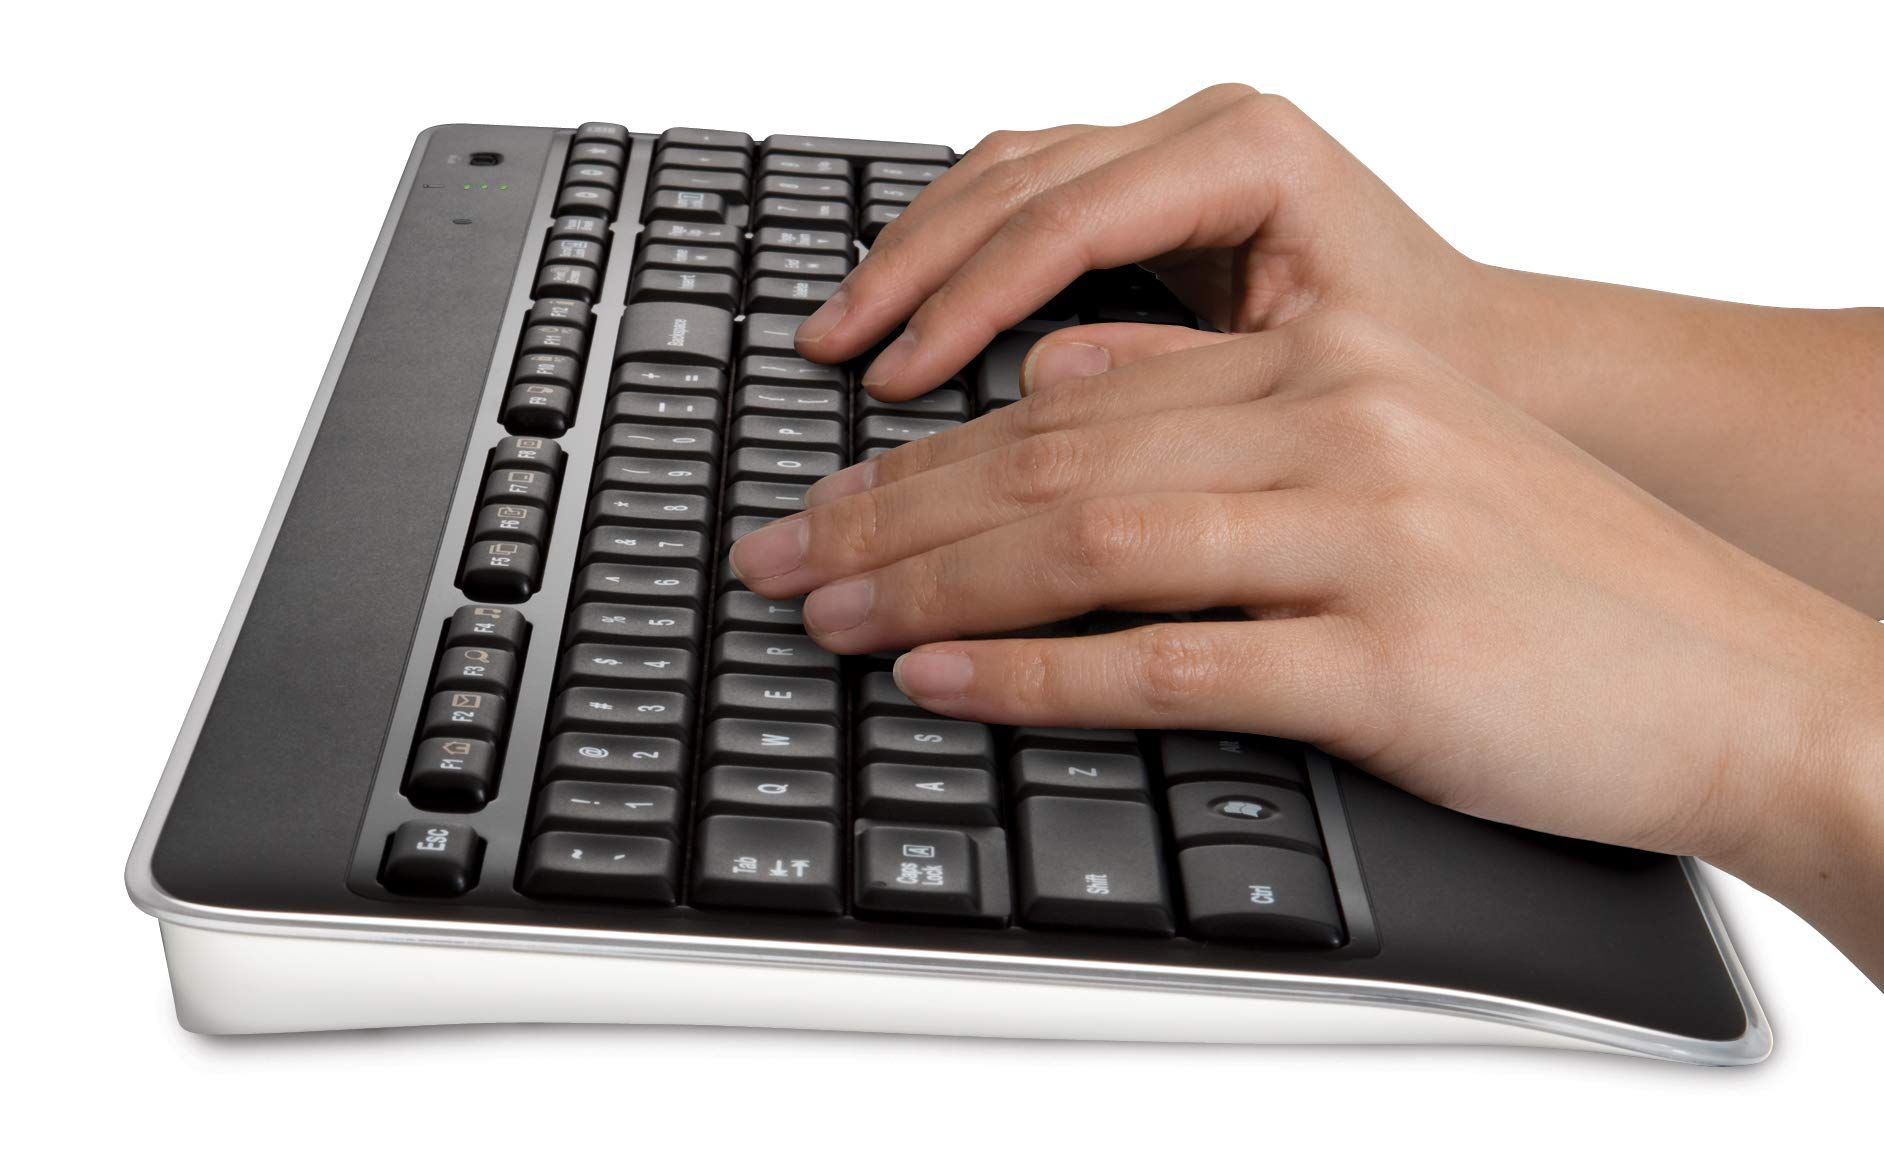 d6af9ddf950 Logitech K800 Wireless Illuminated Keyboard - Backlit Keyboard,  Fast-Charging, Dropout-Free 2.4GHz Connection,#Illuminated, #Keyboard, # Backlit, #Logitech